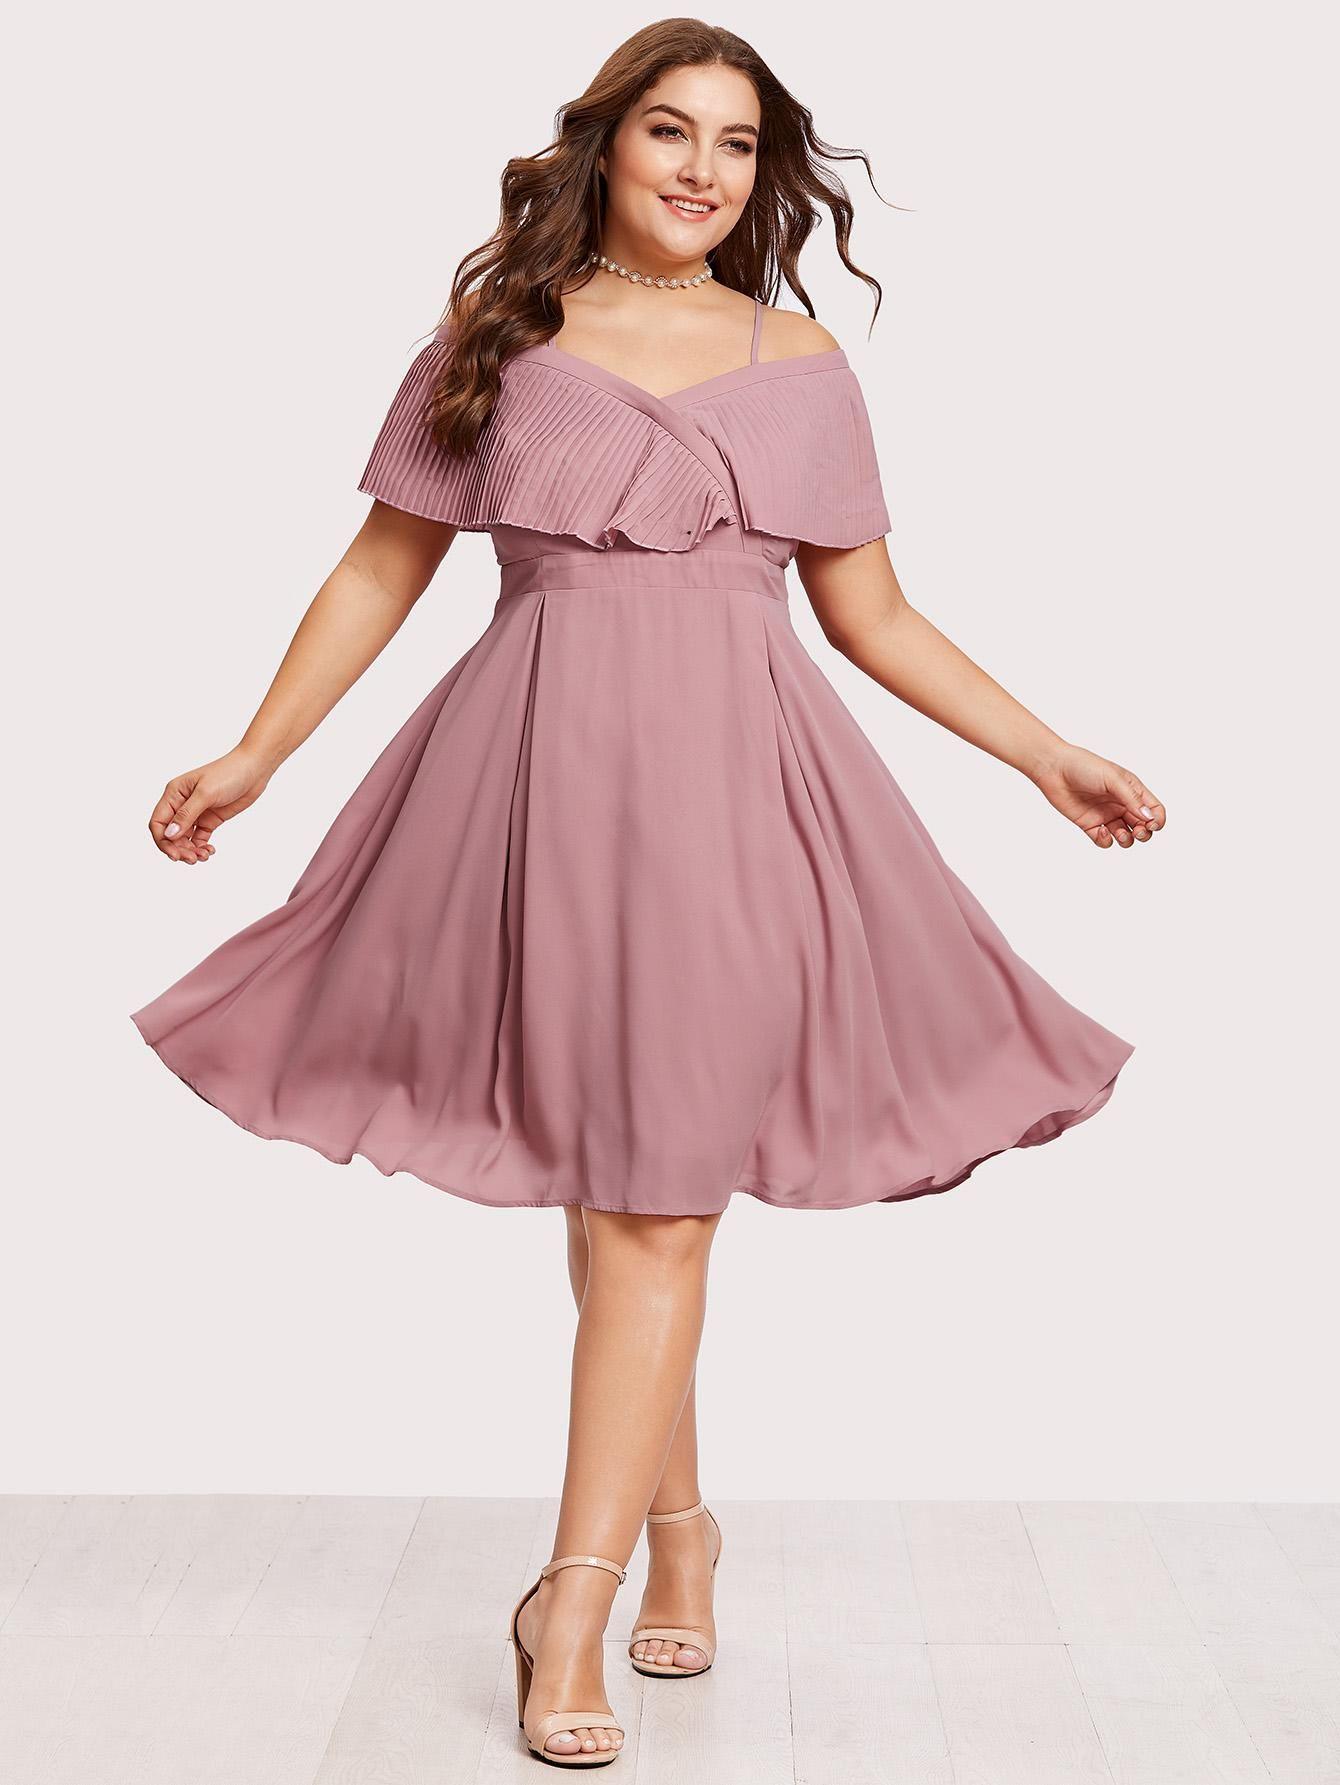 Shein Shein Pleated Flounce Trim Overlap Bardot Dress Adorewe Com Plus Size Party Dresses Plus Size Cocktail Dresses Plus Size Fashion [ 1785 x 1340 Pixel ]